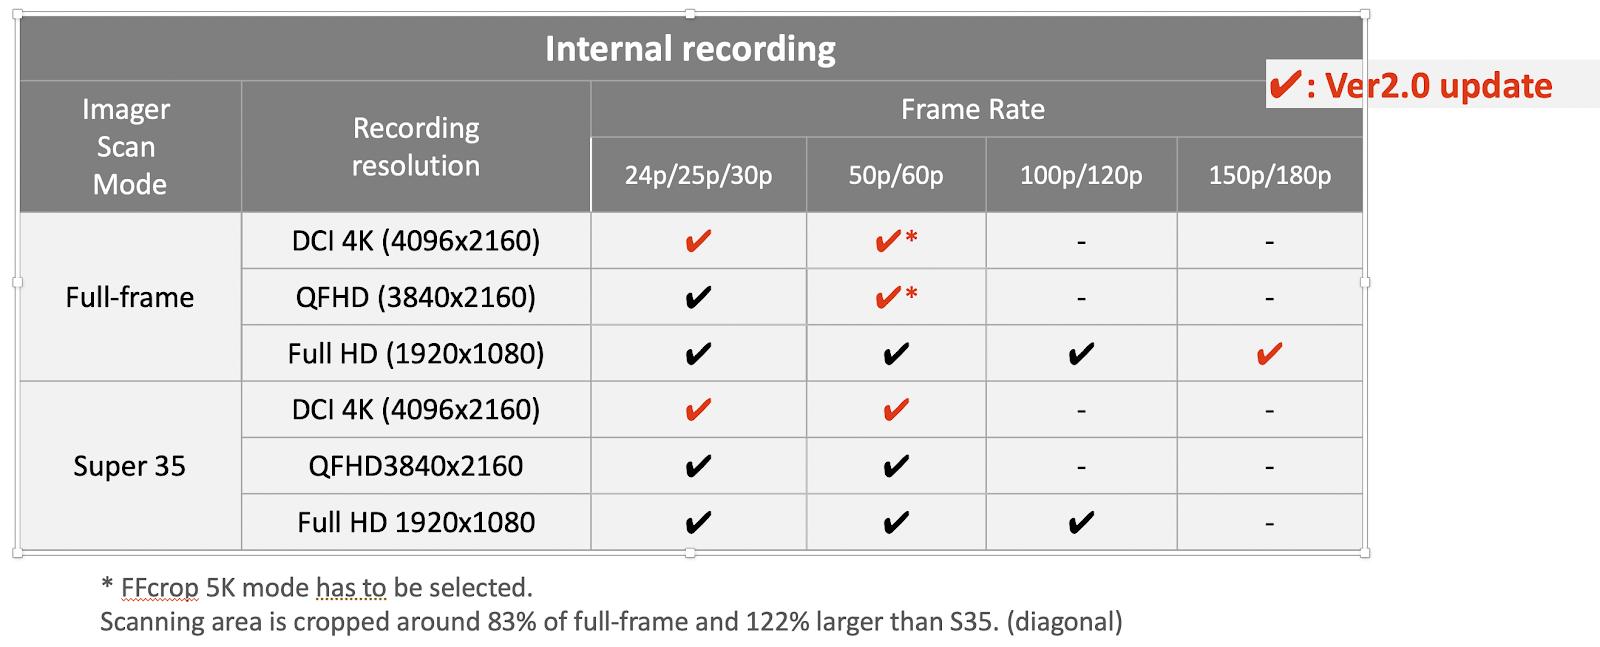 Internal Recording